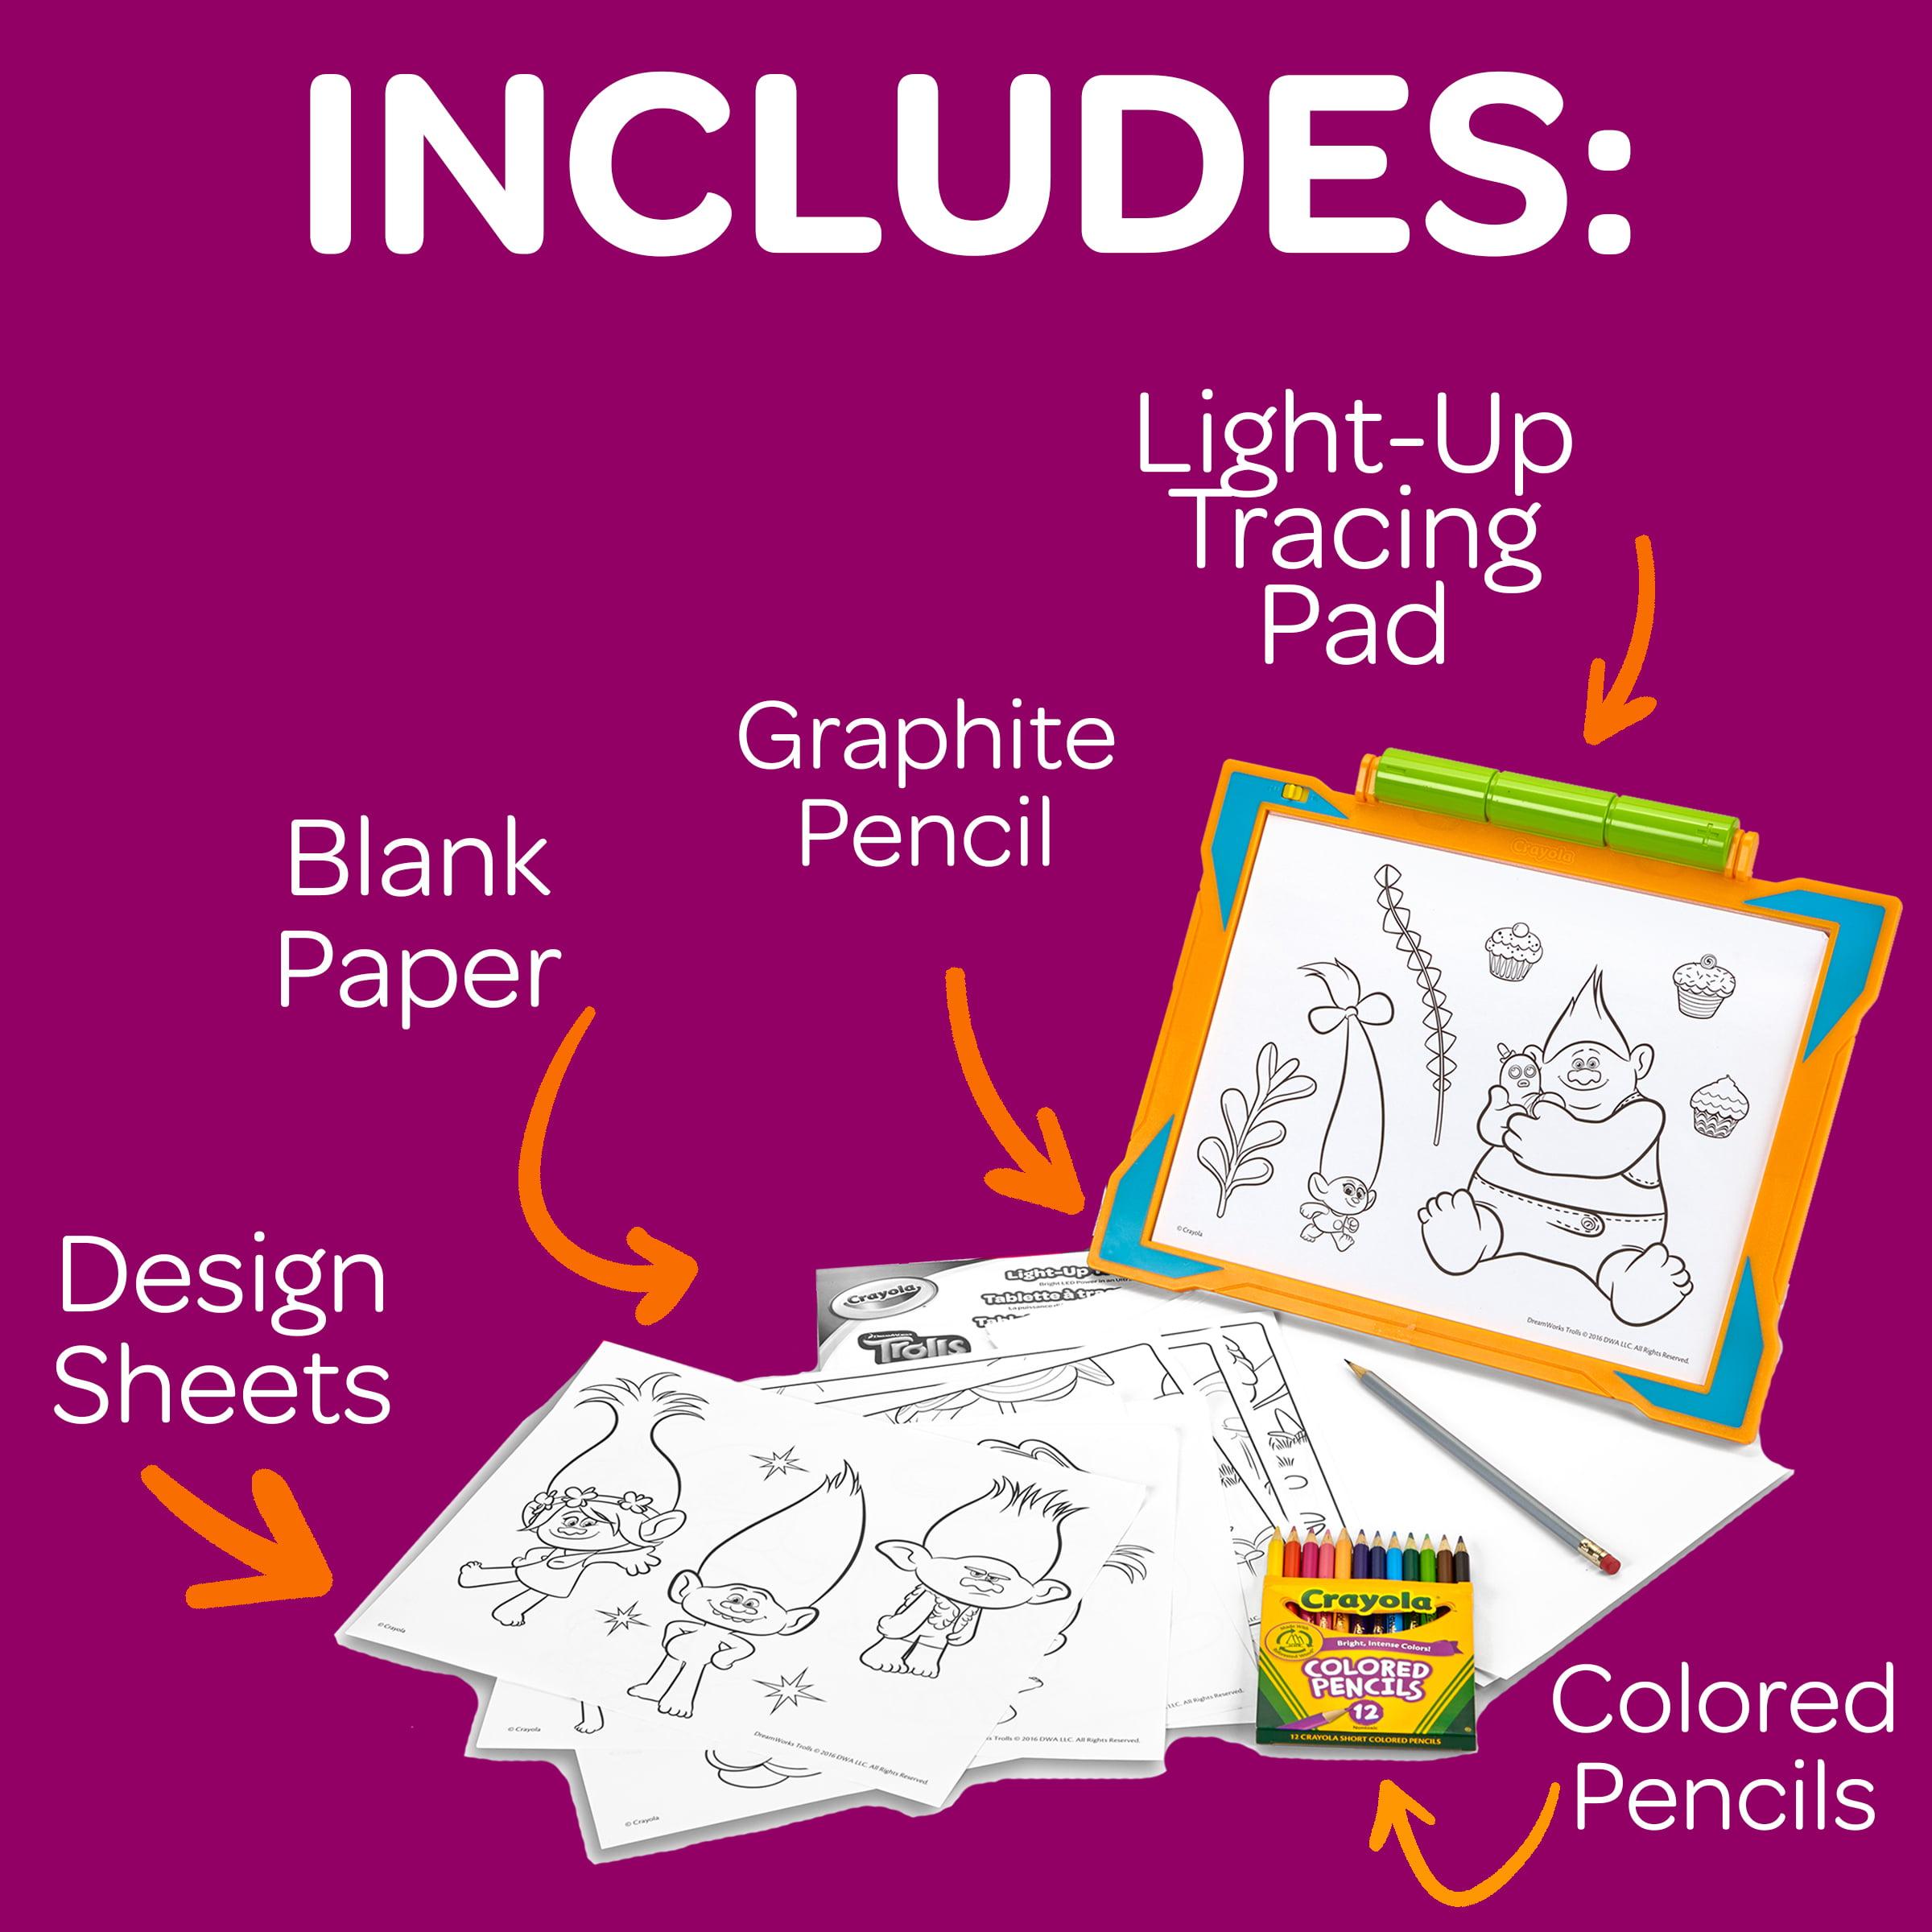 Crayola Trolls Light Up Tracing Pad Gift Toys For Kids Ages 6 Walmart Com Walmart Com